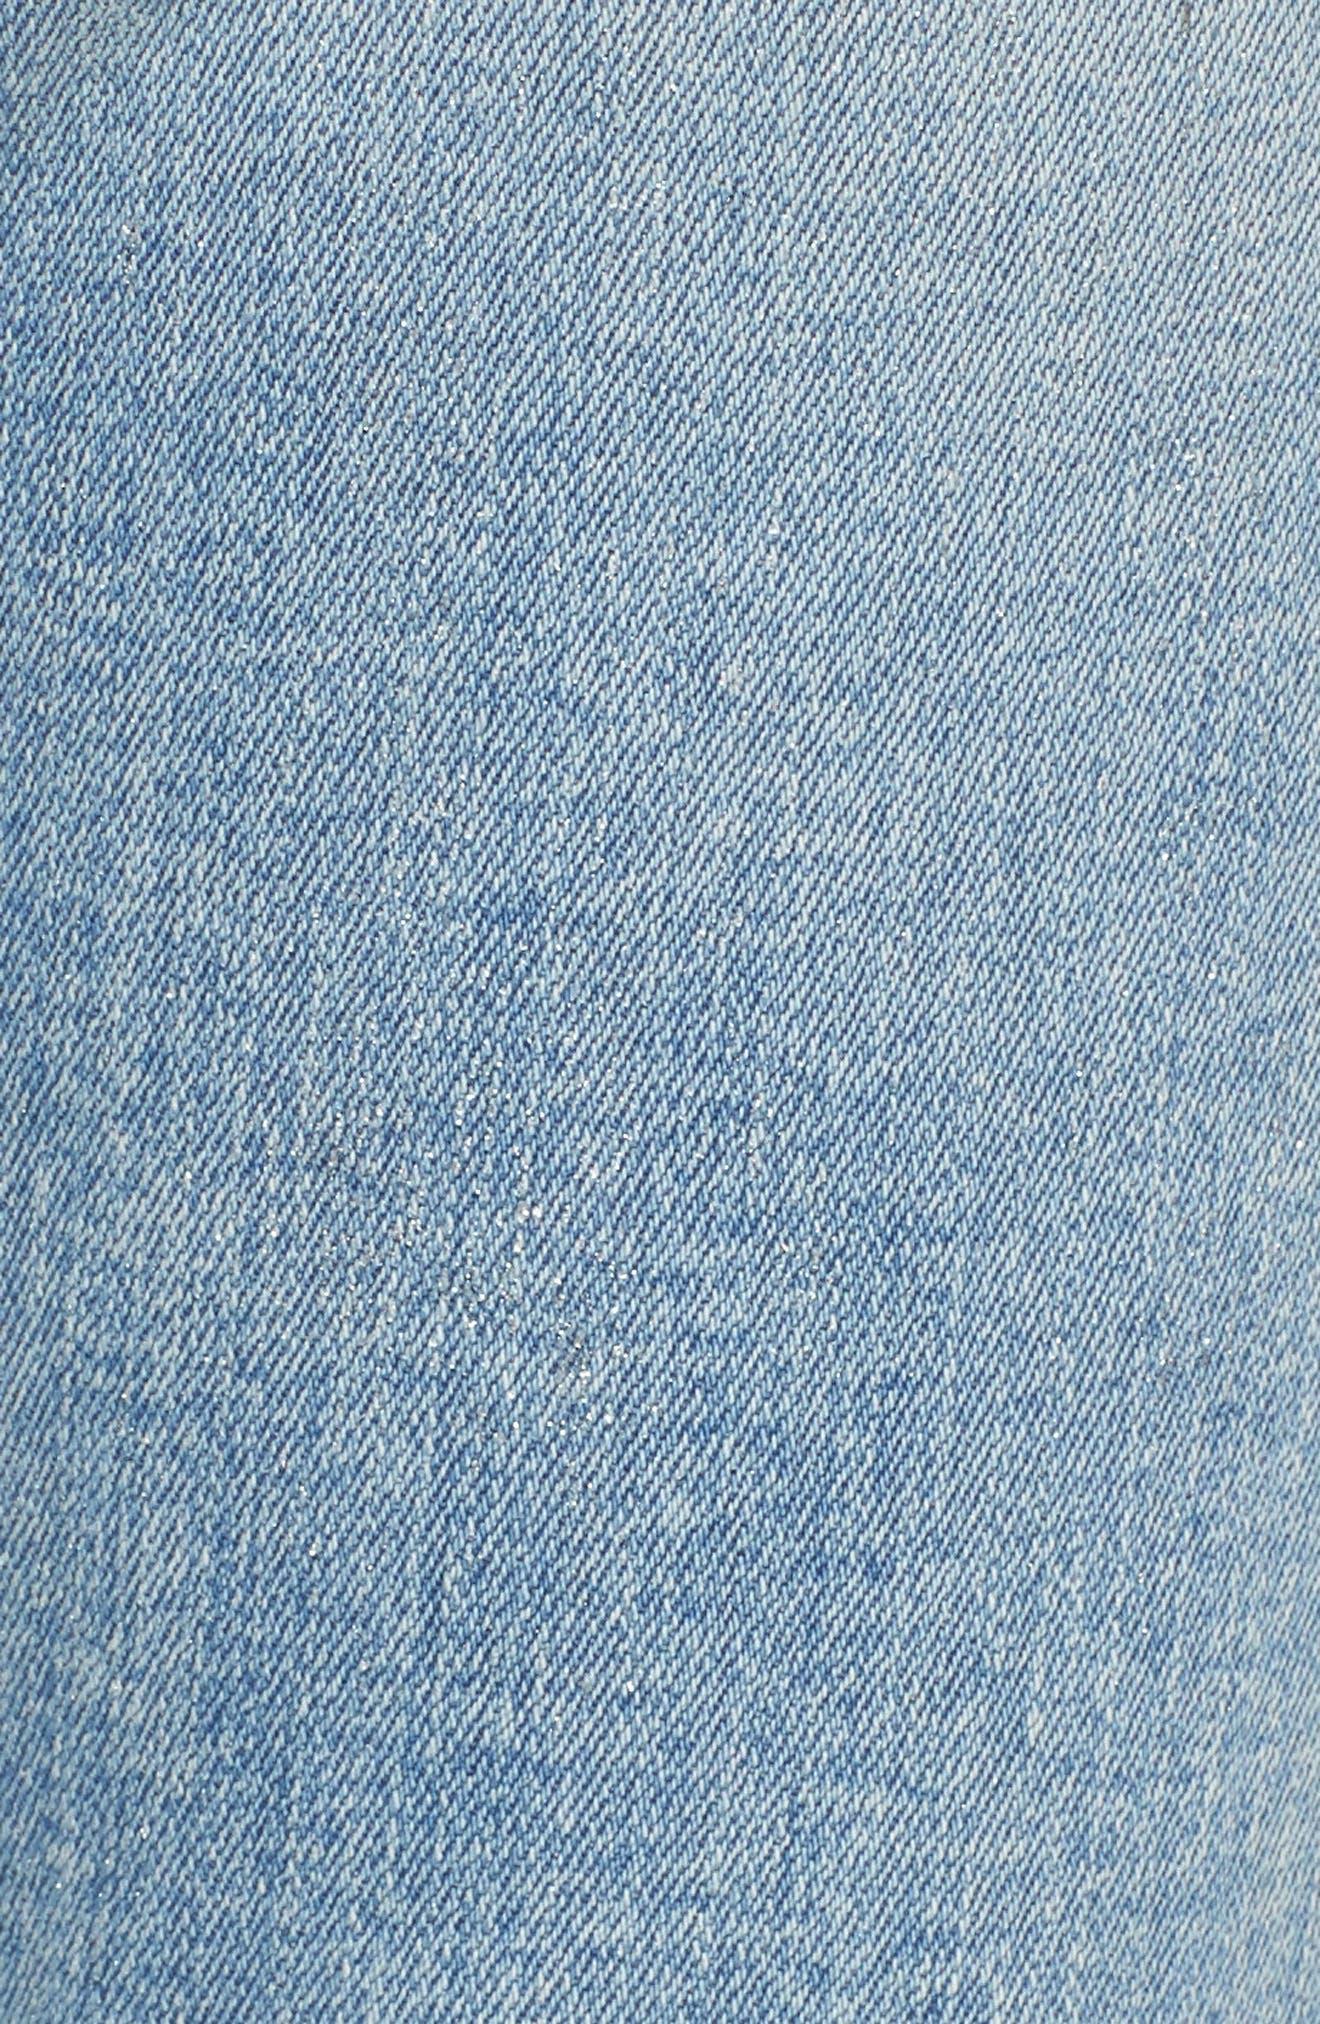 The Stiletto High Waist Skinny Jeans,                             Alternate thumbnail 5, color,                             Seville Destroy/ Foil